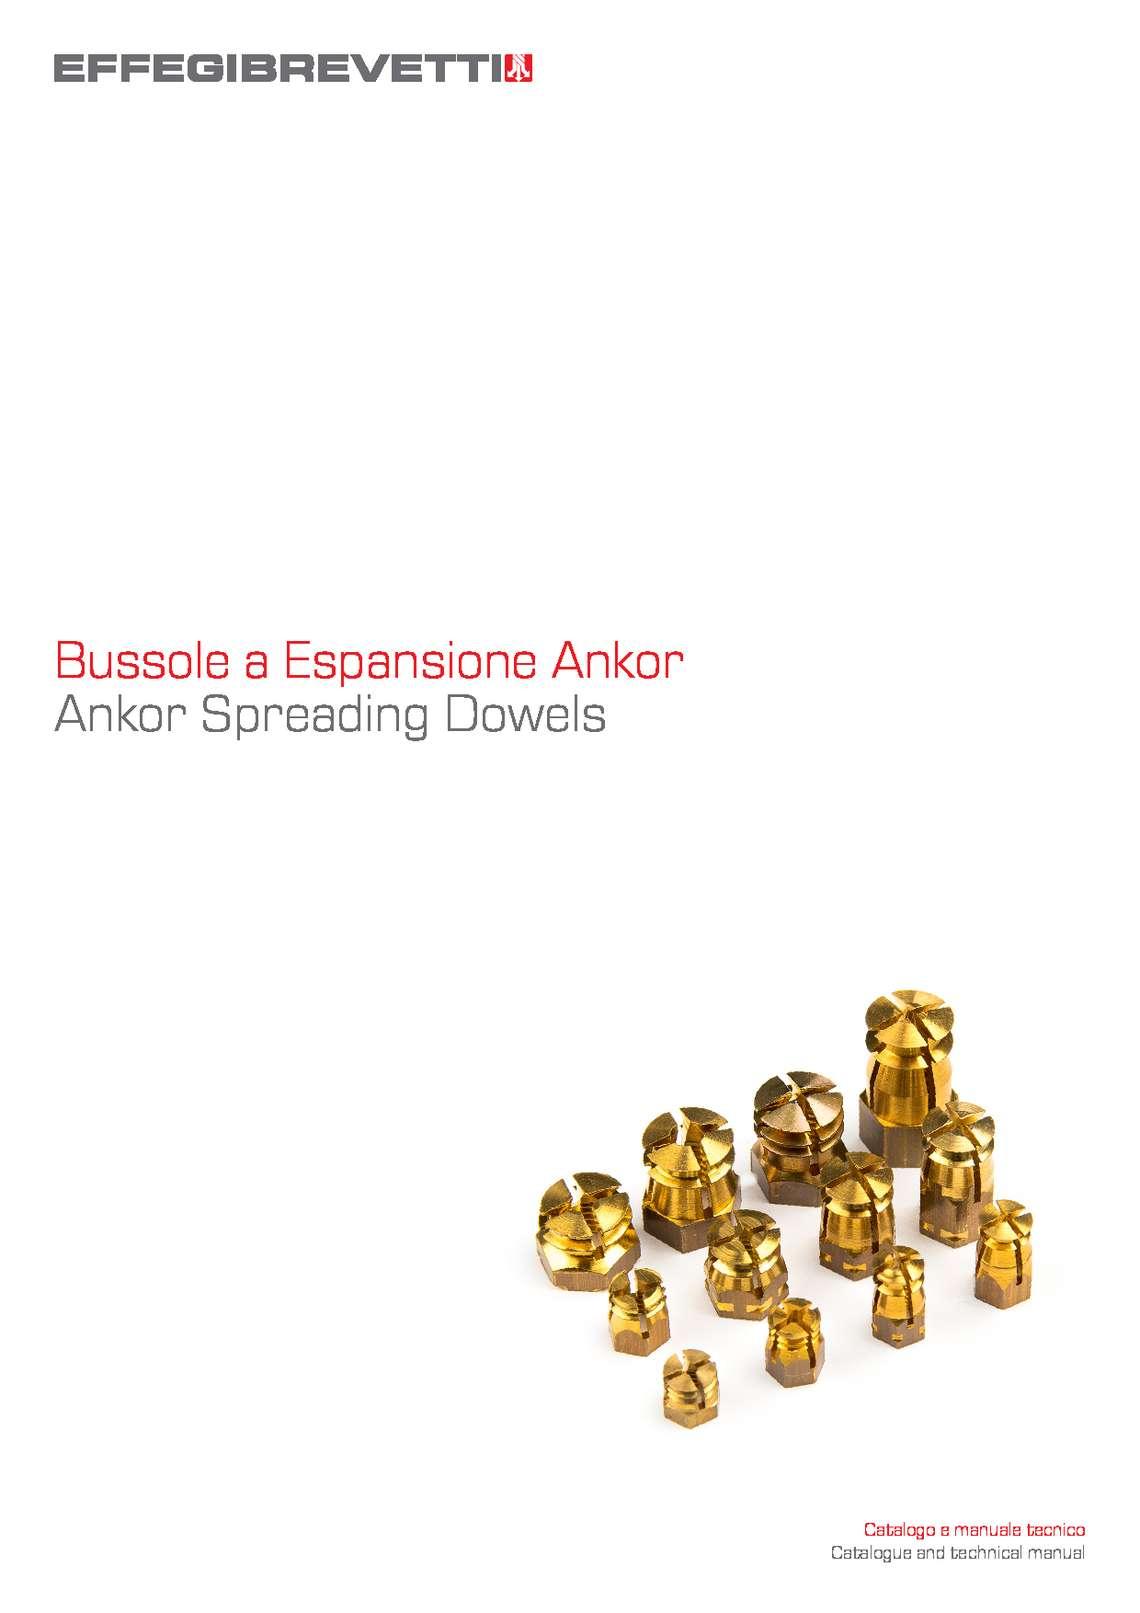 Bussole a Espansione Ankor